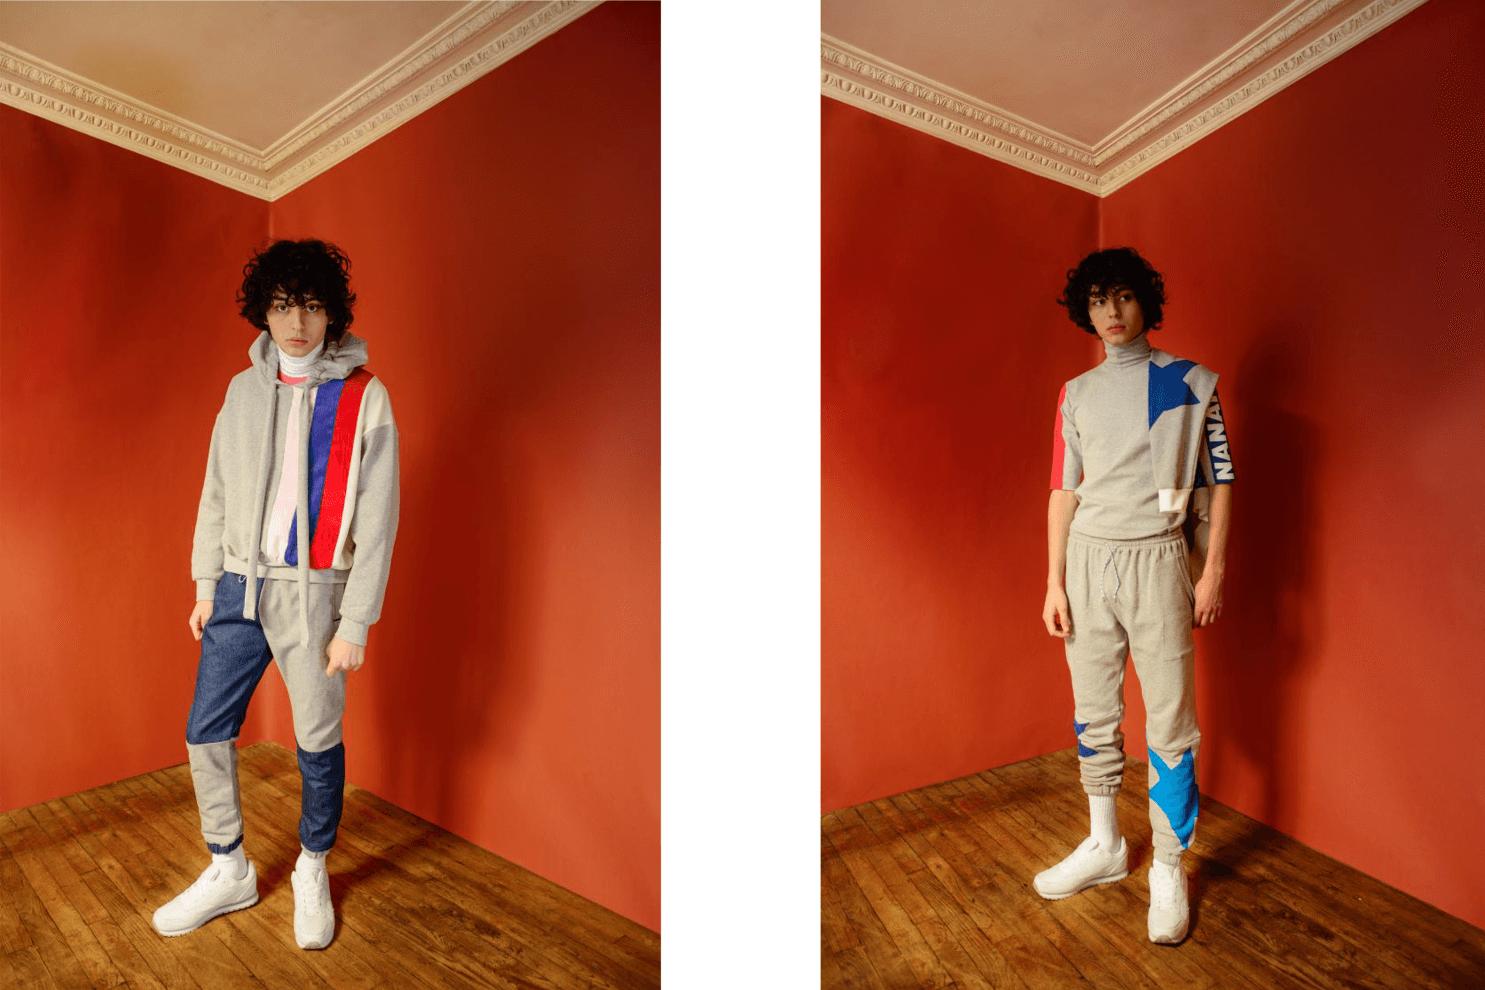 NeoL Magazine JP | Model: Louïs Rault 渡邊 | Photo: Palden Macgamwell | Fashion Designer: Noemie Sebayashi | Interview/Text: Lina Hitomi